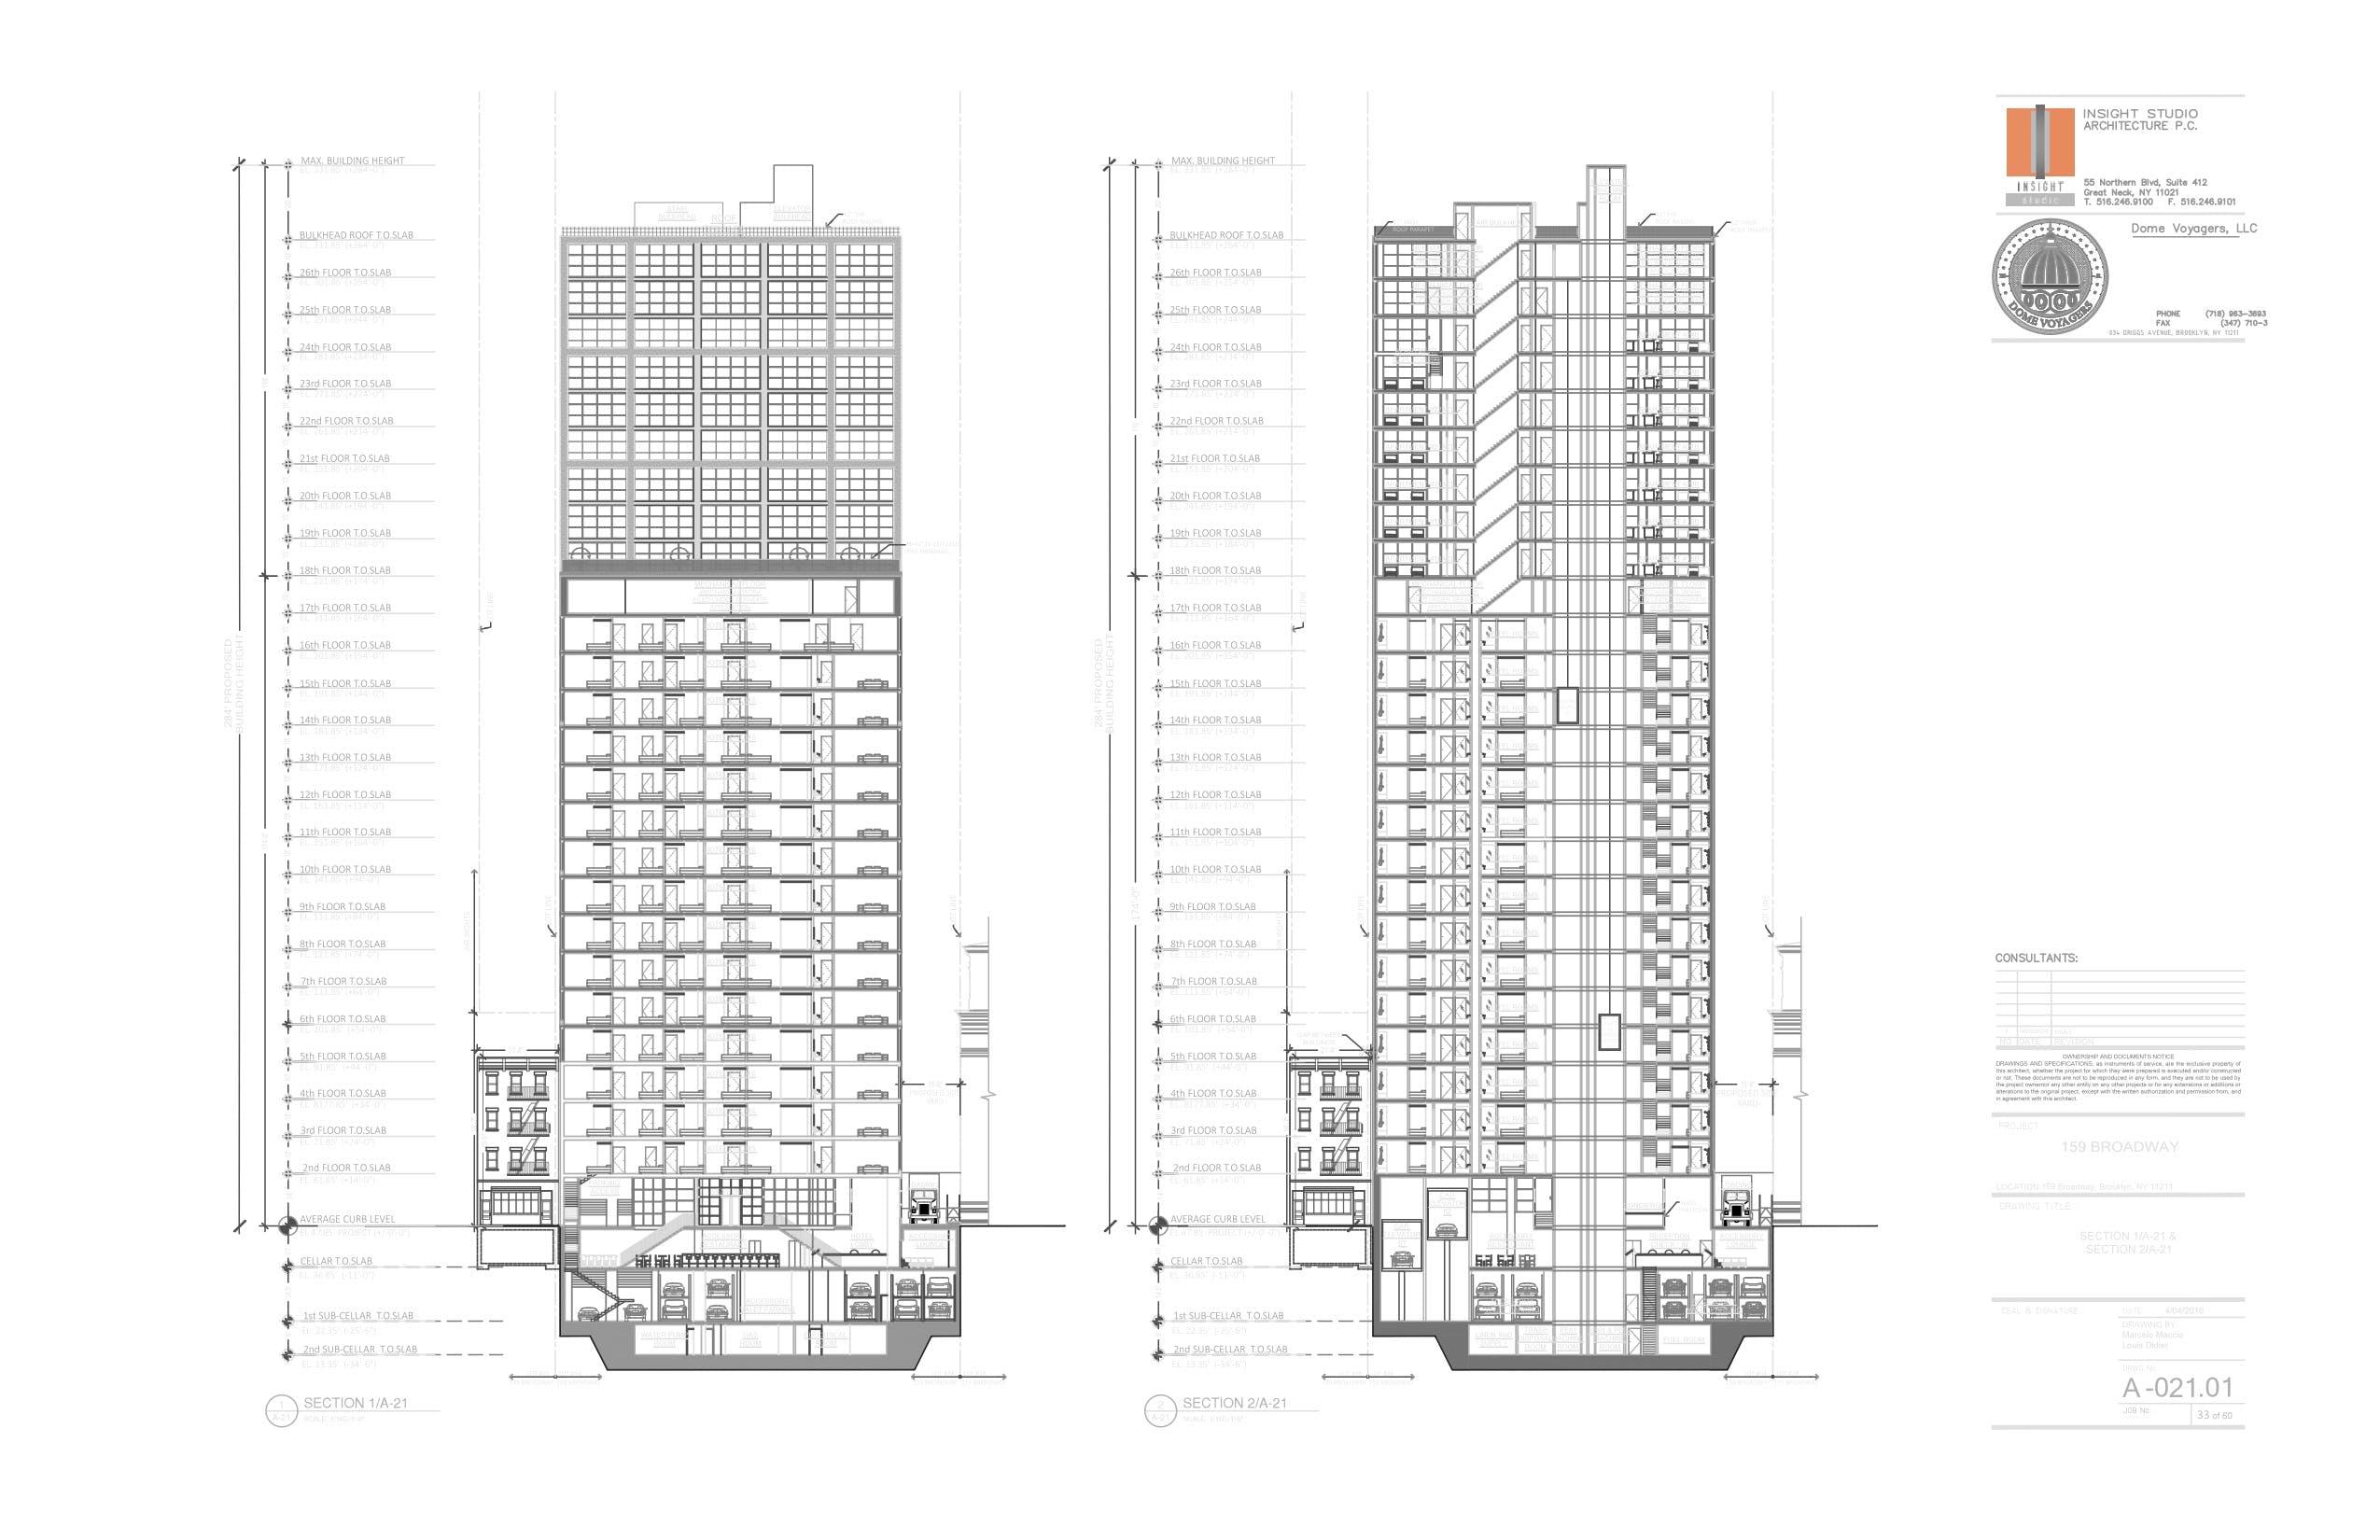 159 Broadway Hotel & Residences, 159 Broadway